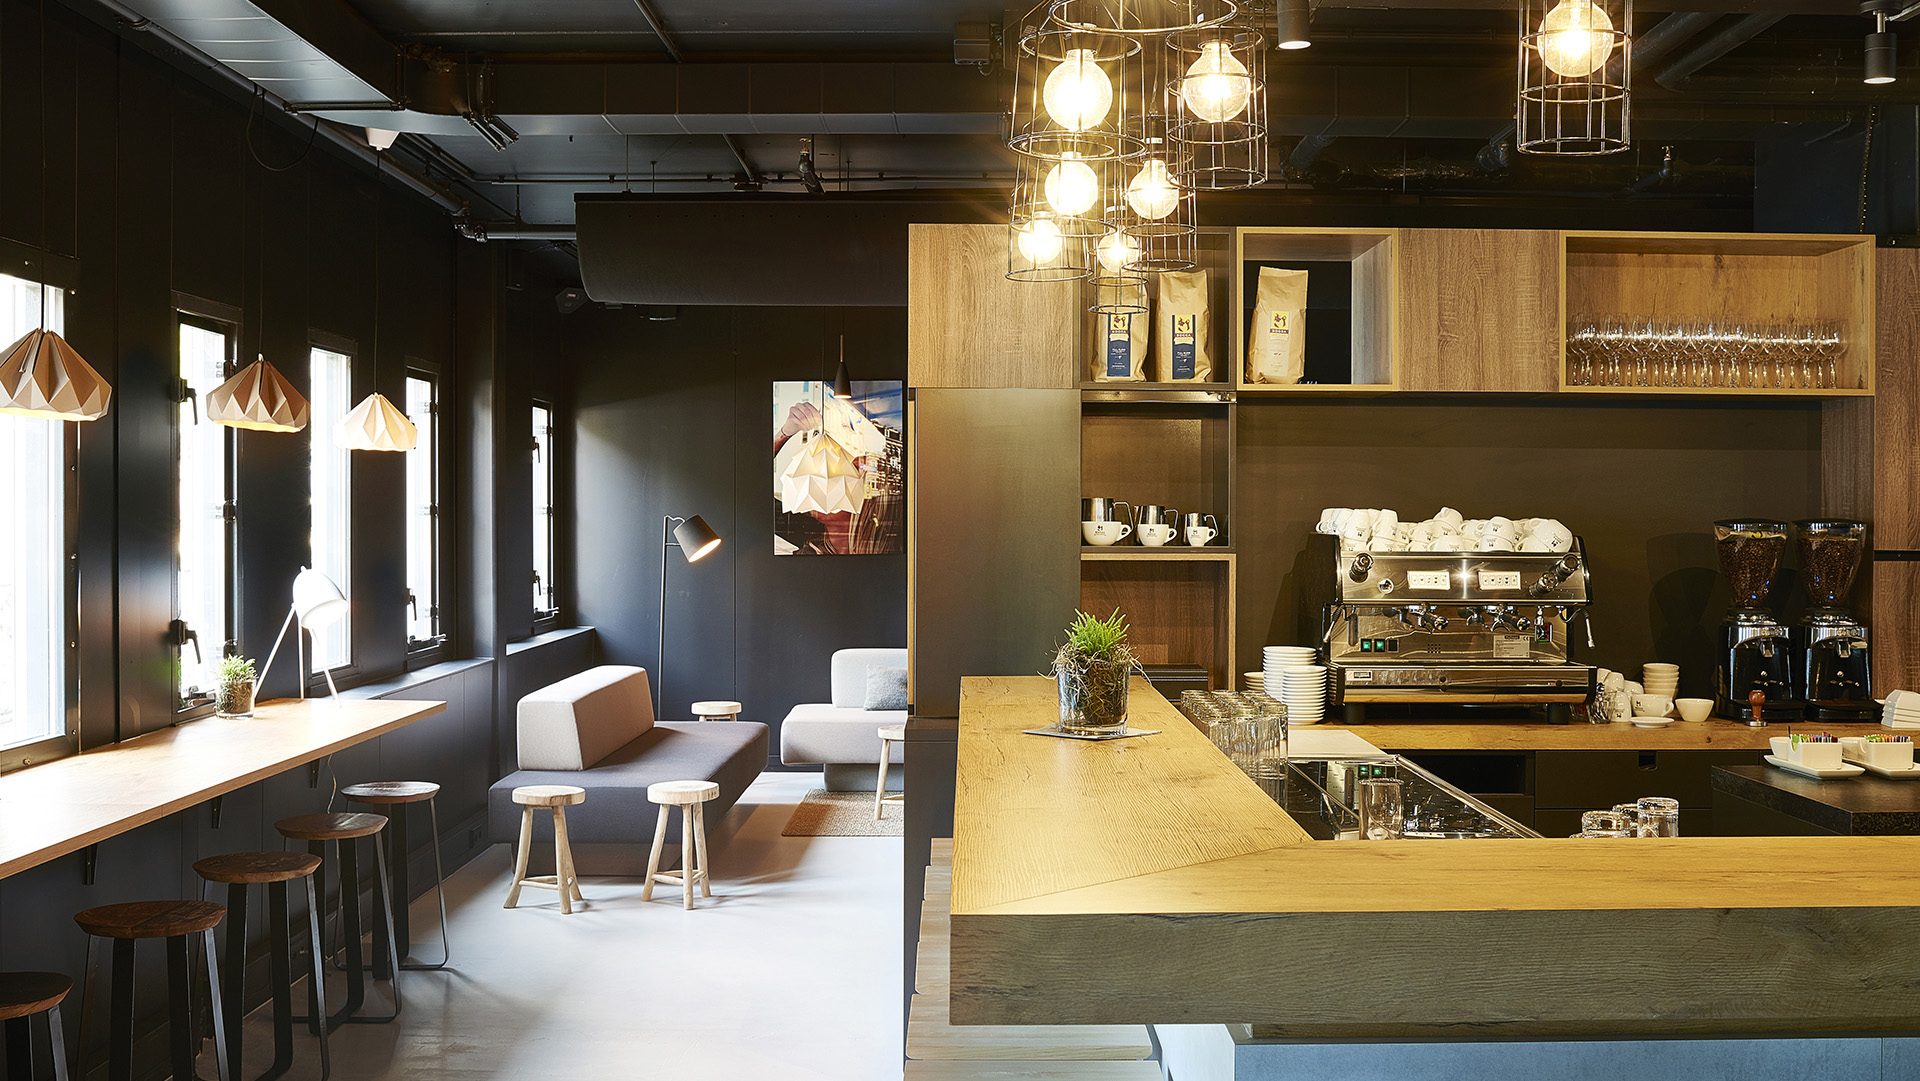 Good-Hotel-Amsterdam-Food-Beverage-Coffee-Bar_253